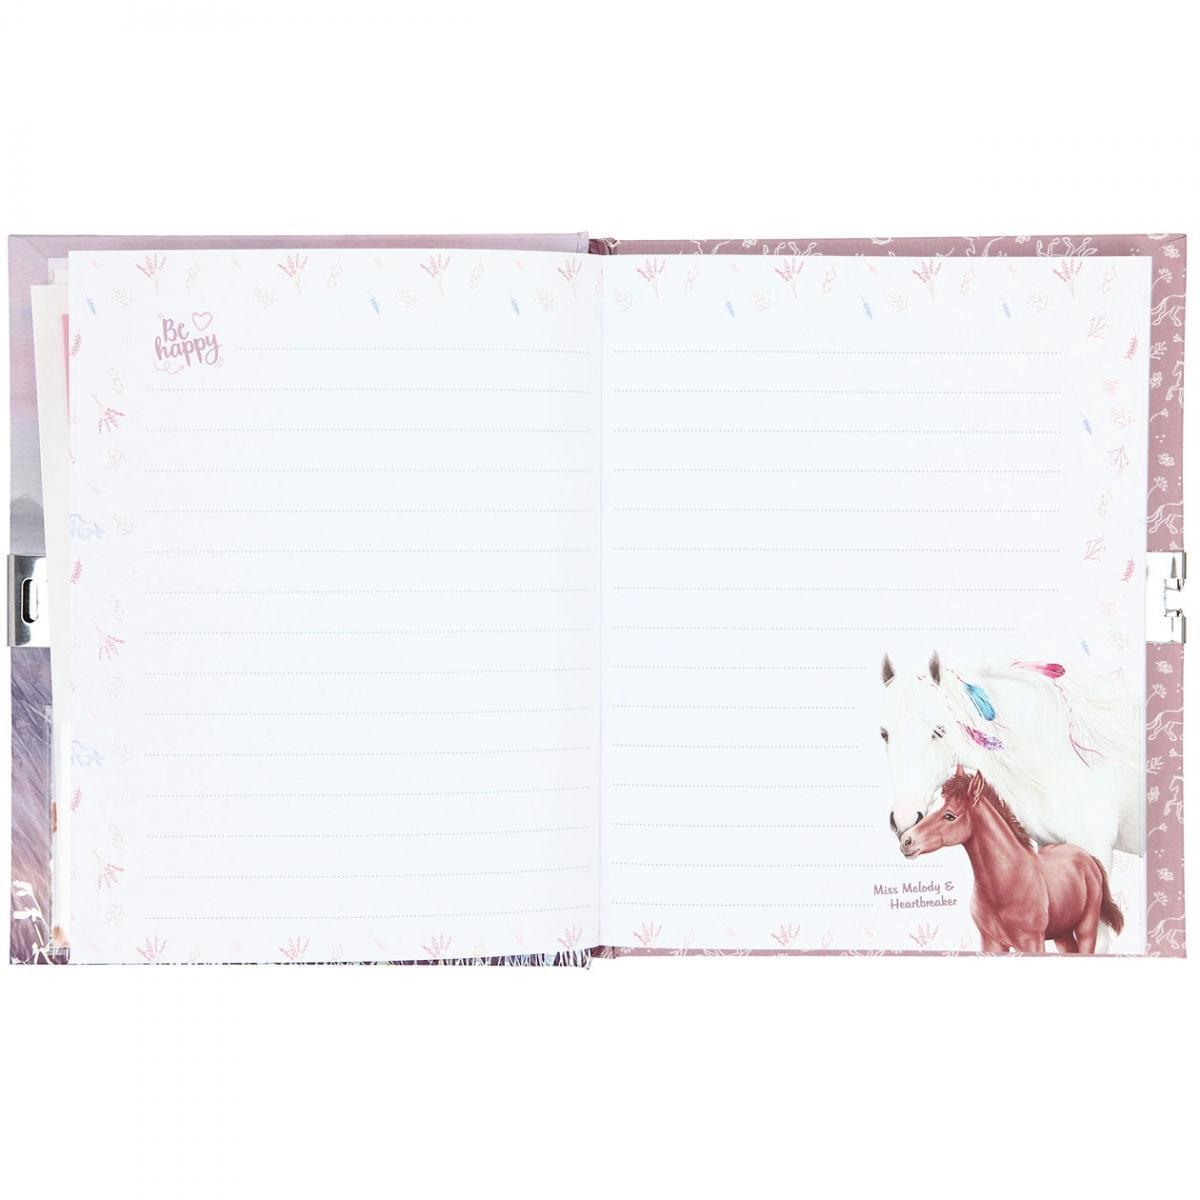 411482 a,Miss melody dagboek